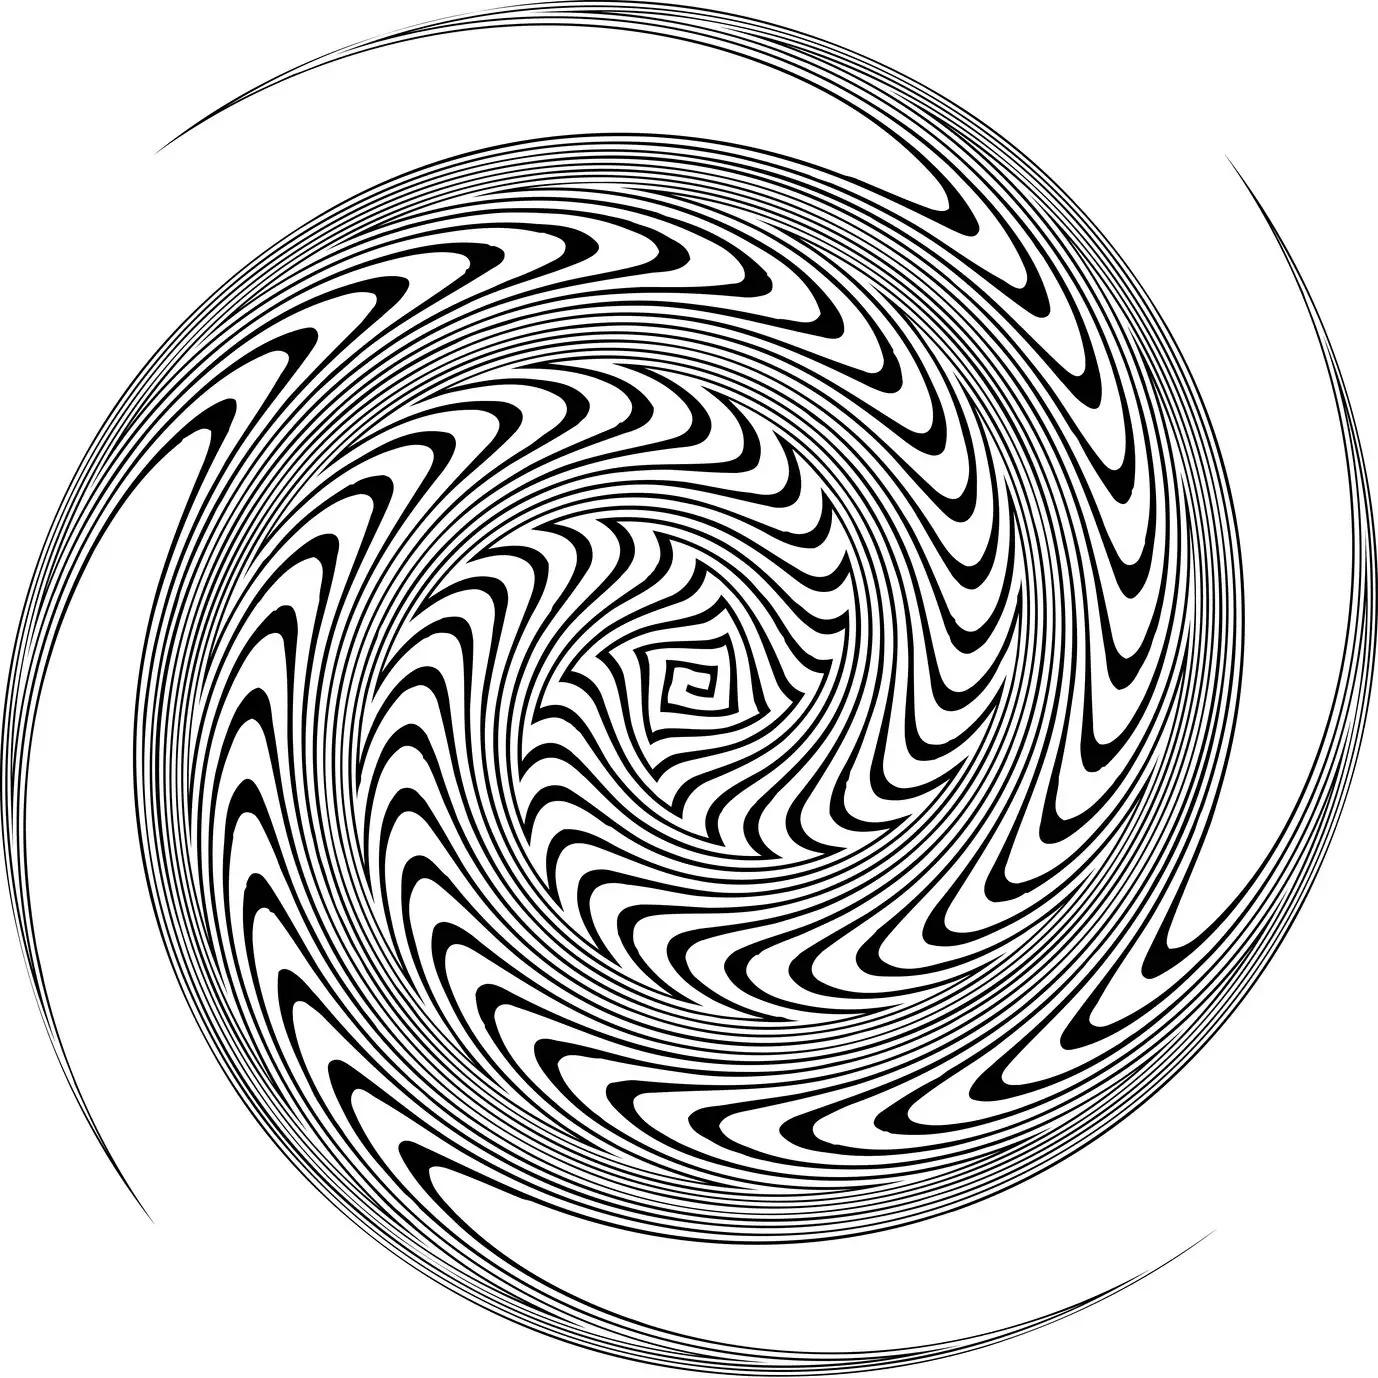 Mandala To Color Patterns Geometric 1